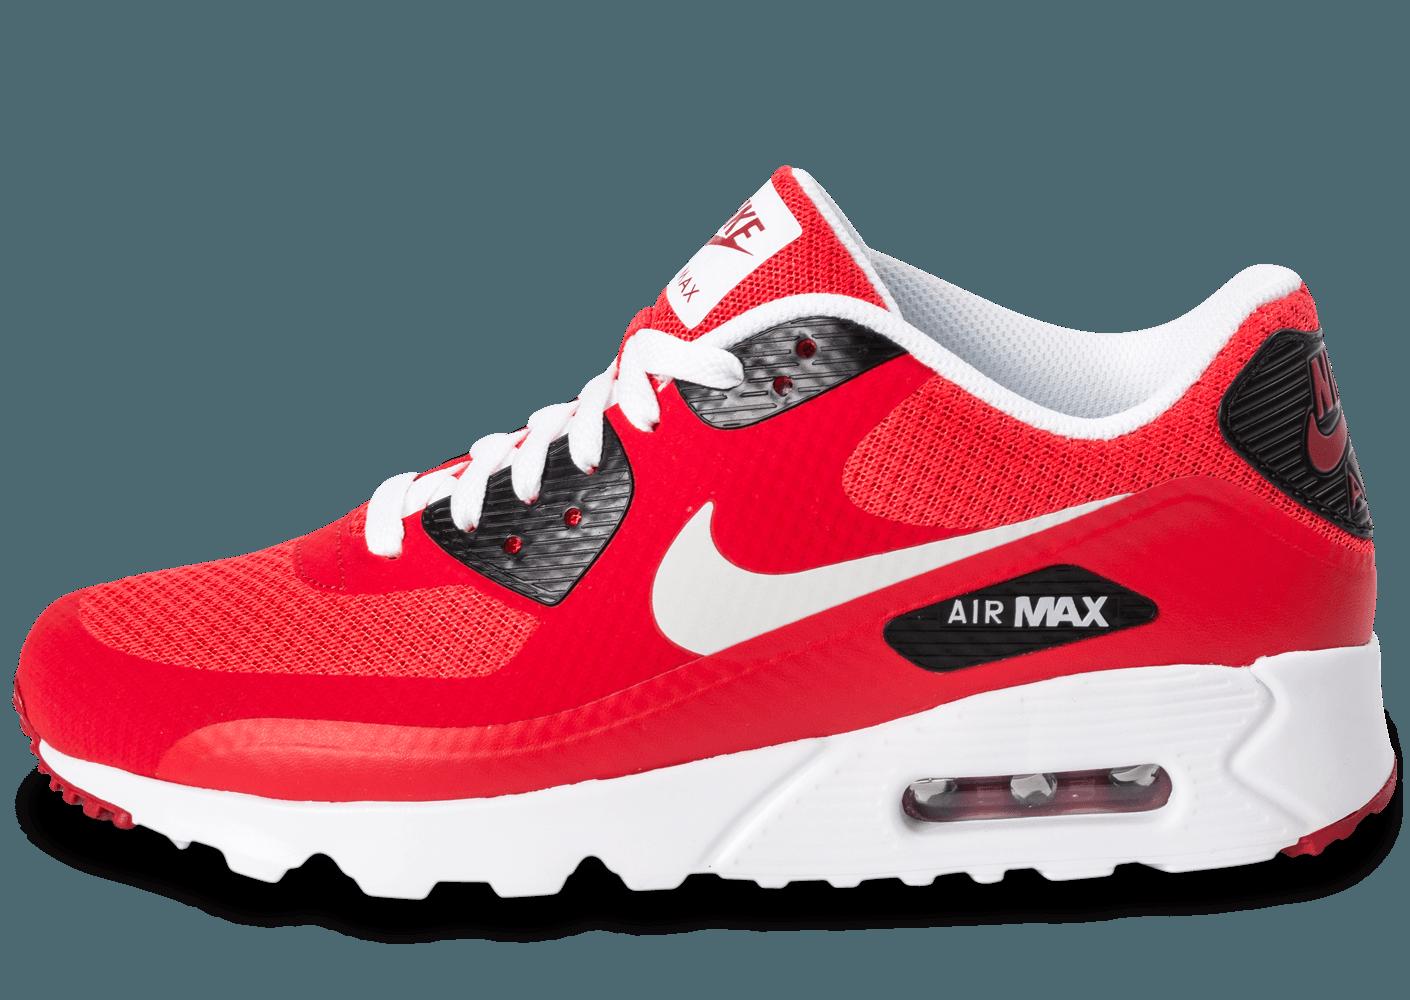 best service 5a659 43486 Cliquez pour zoomer Chaussures Nike Air Max 90 Ultra Essential rouge vue  extérieure ... ... Chaussures Nike Air Max 90 Ultra Essential rouge vue  avant .